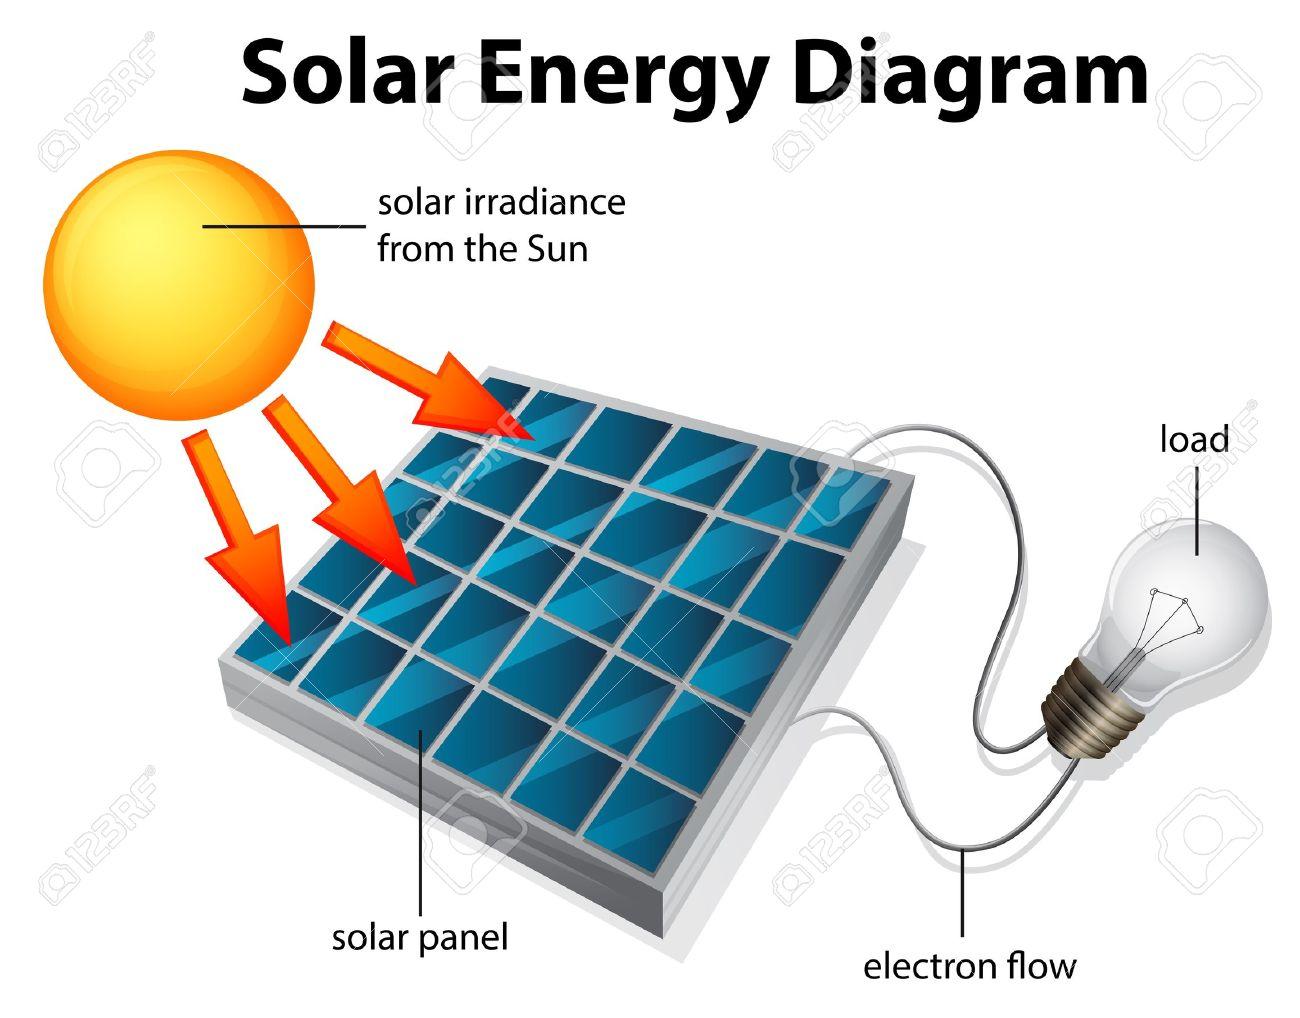 21637771 Illustration showing the diagram of solar energy Stock Vector panel yaskawa z1000 wiring diagram ke100 wiring diagram \u2022 45 63 74 91  at sewacar.co